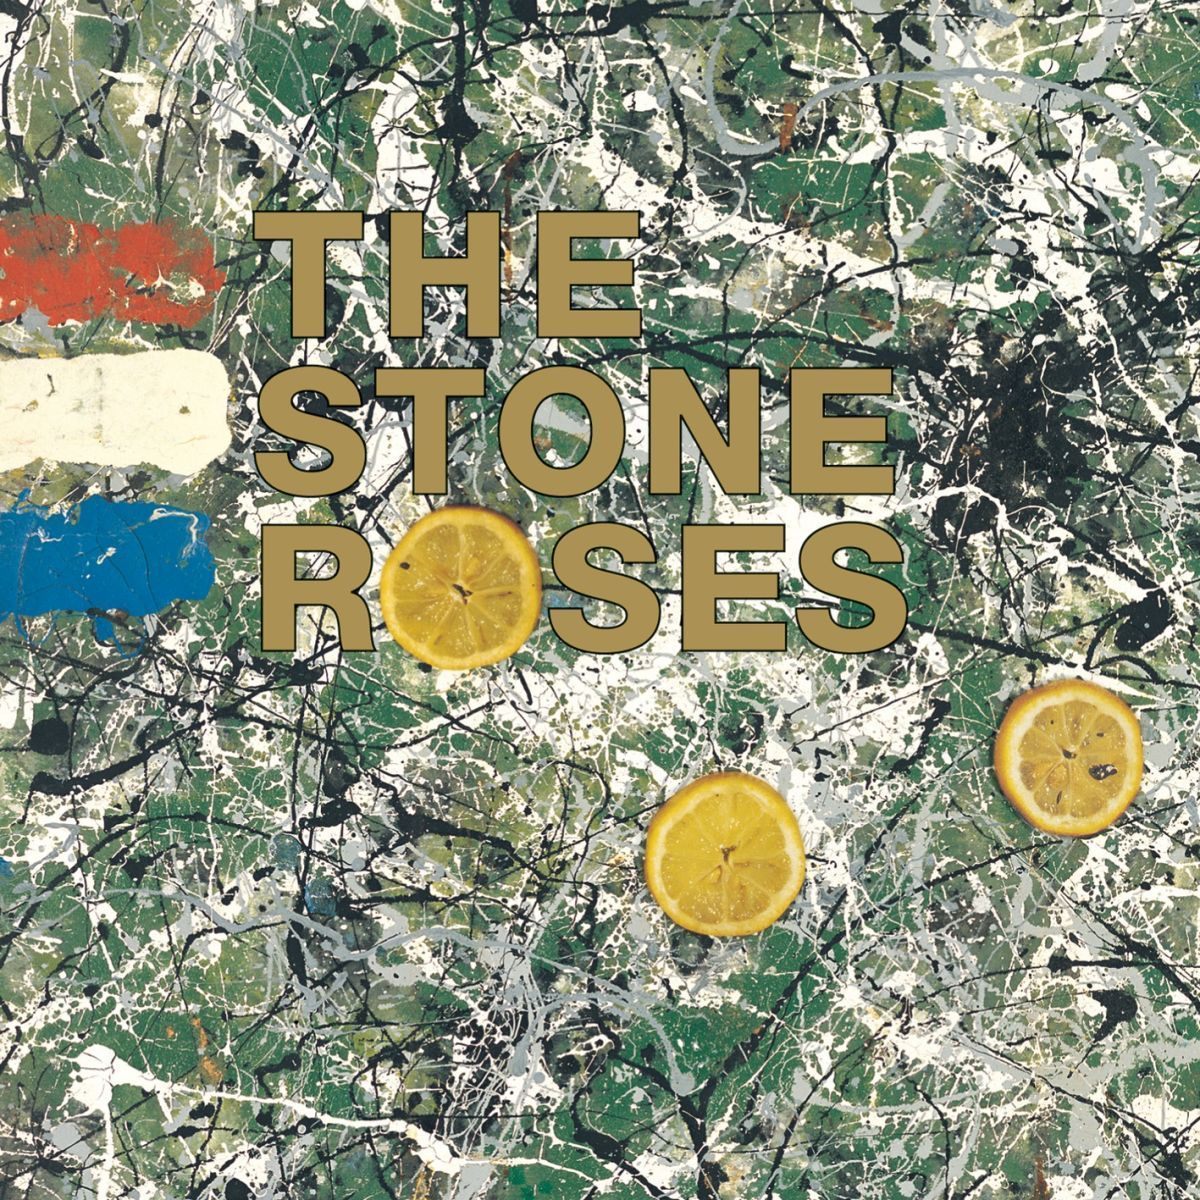 The Stone Roses - Stone Roses album cover